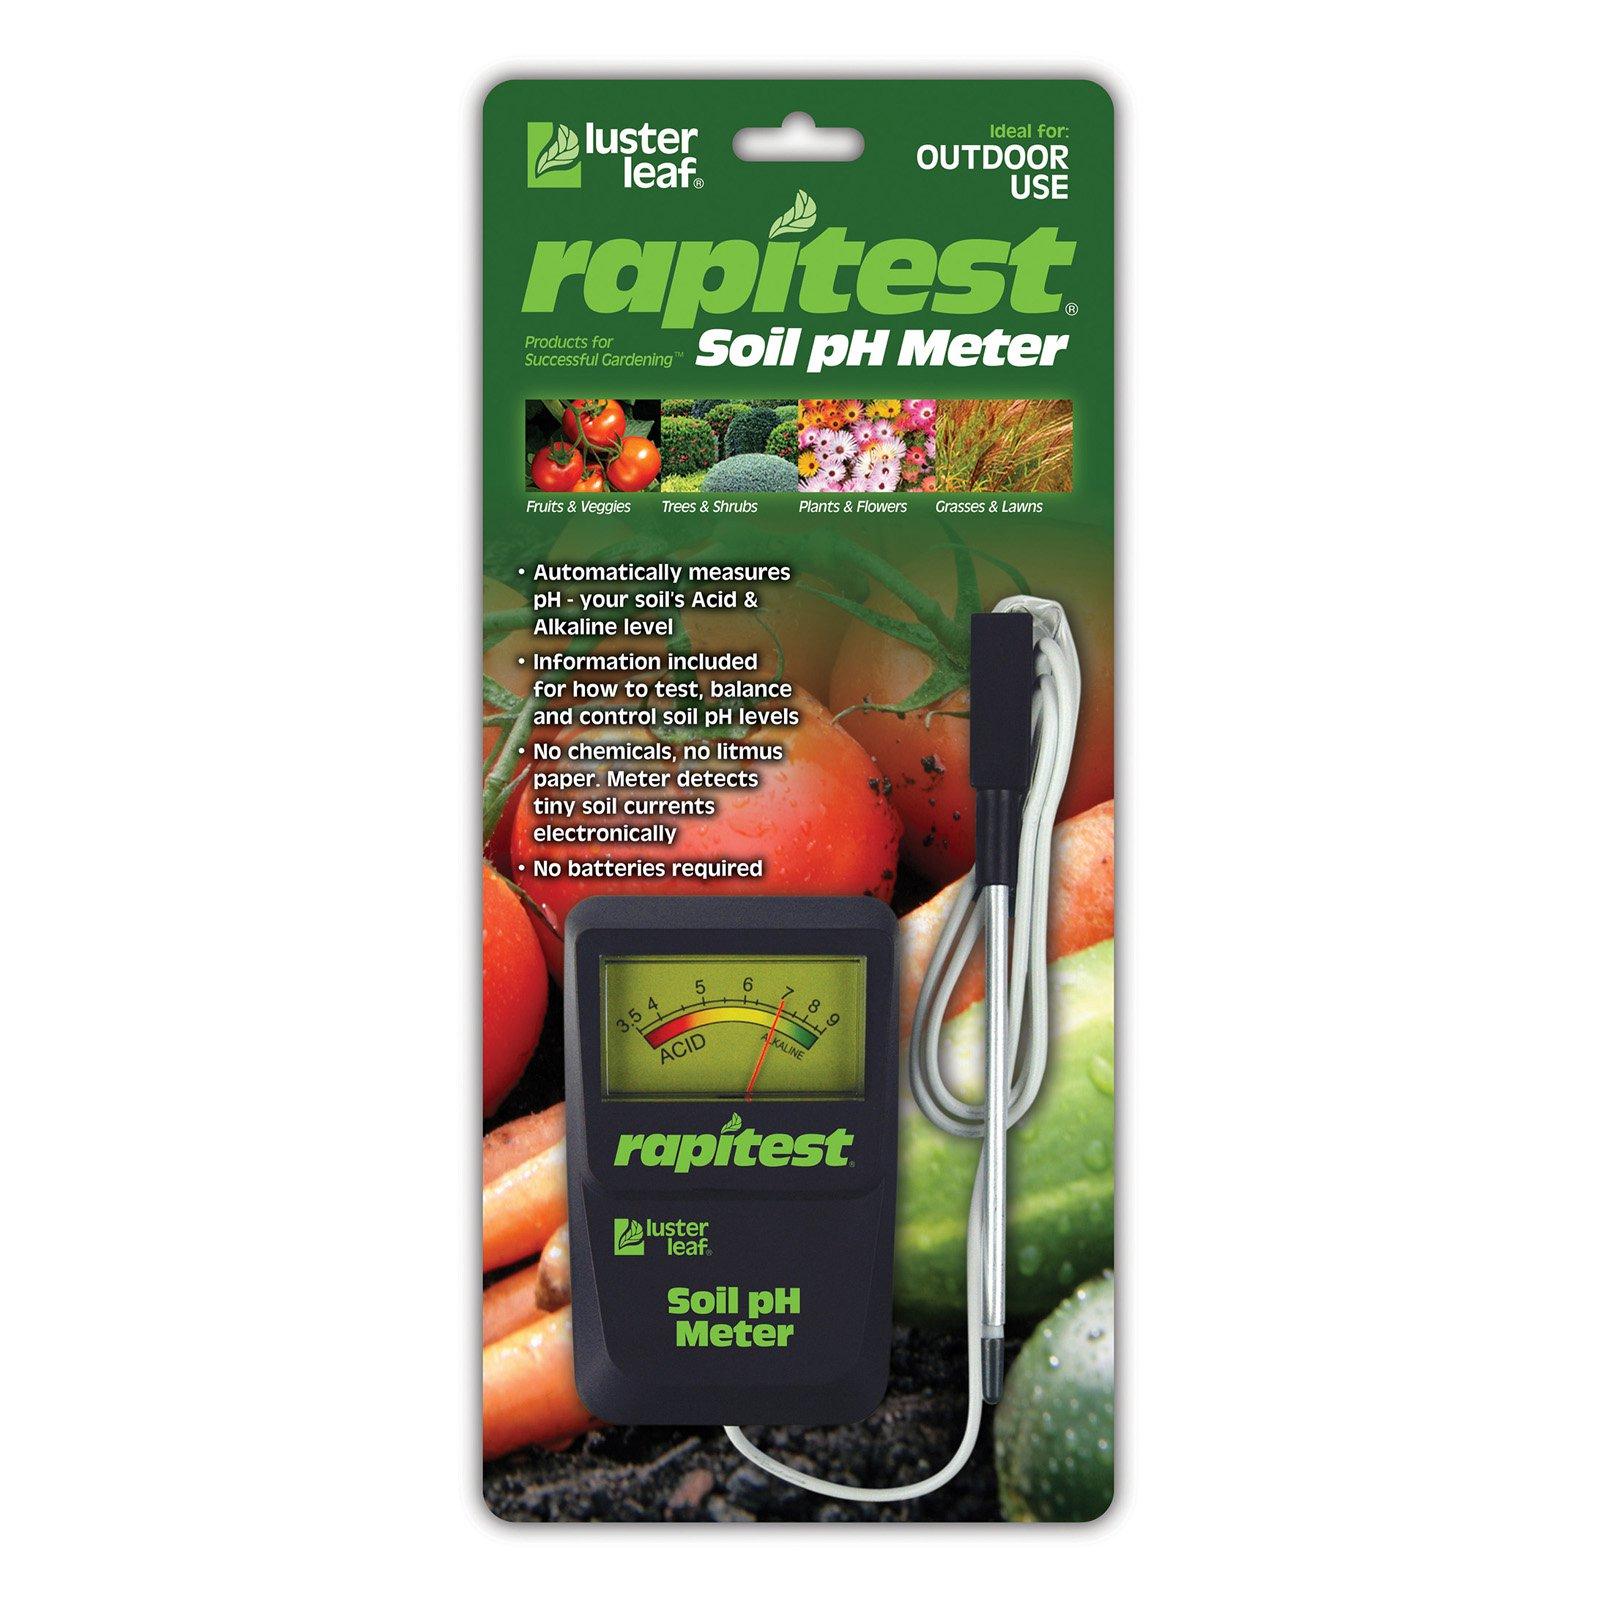 Luster Leaf Rapitest Soil pH Meter